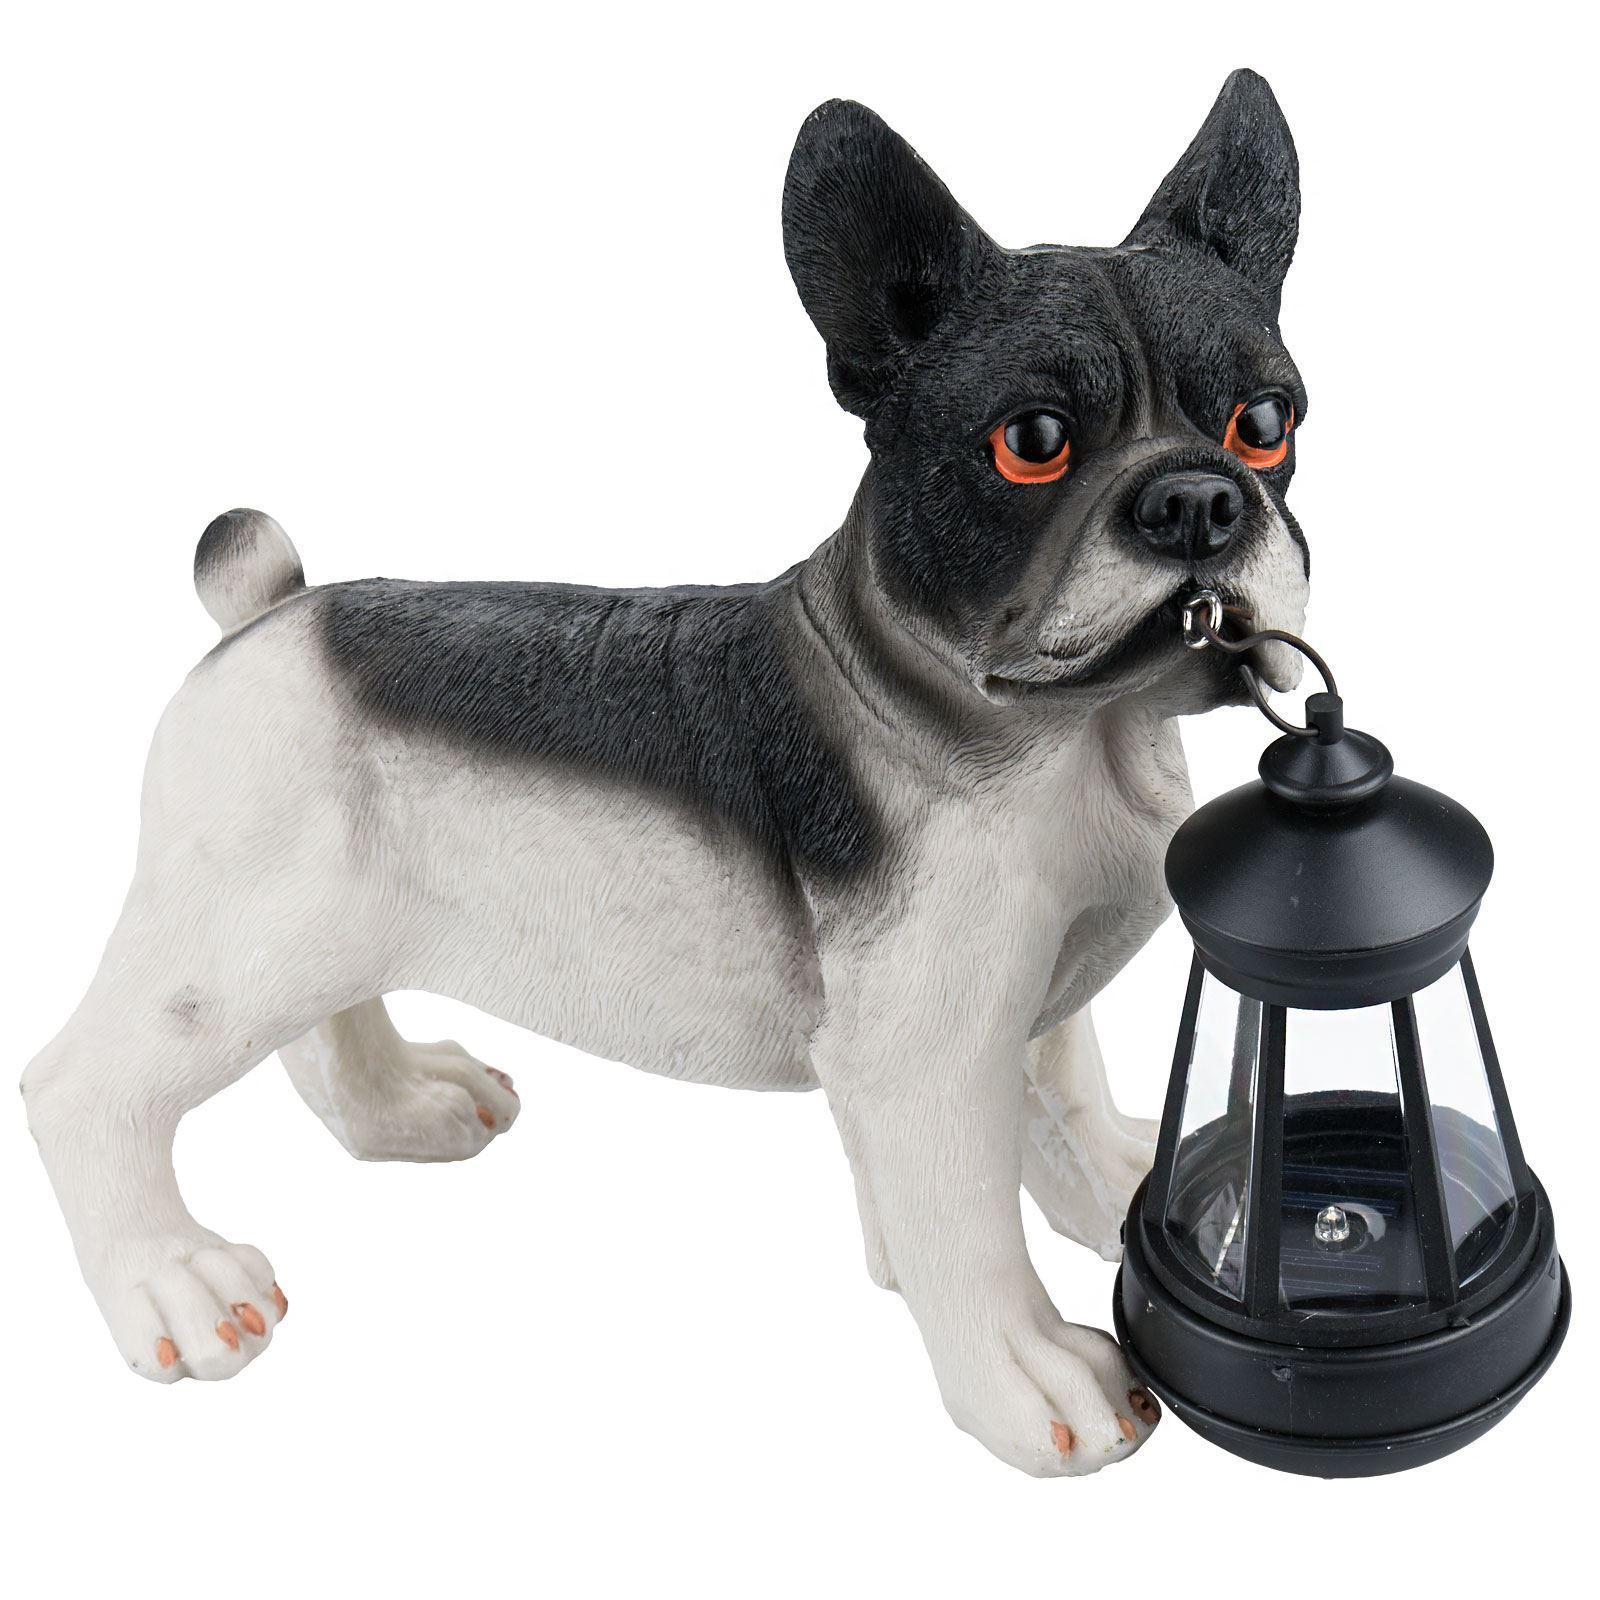 solaire nergie led bulldog lumi re chien d coration jardin ornement de animal ebay. Black Bedroom Furniture Sets. Home Design Ideas